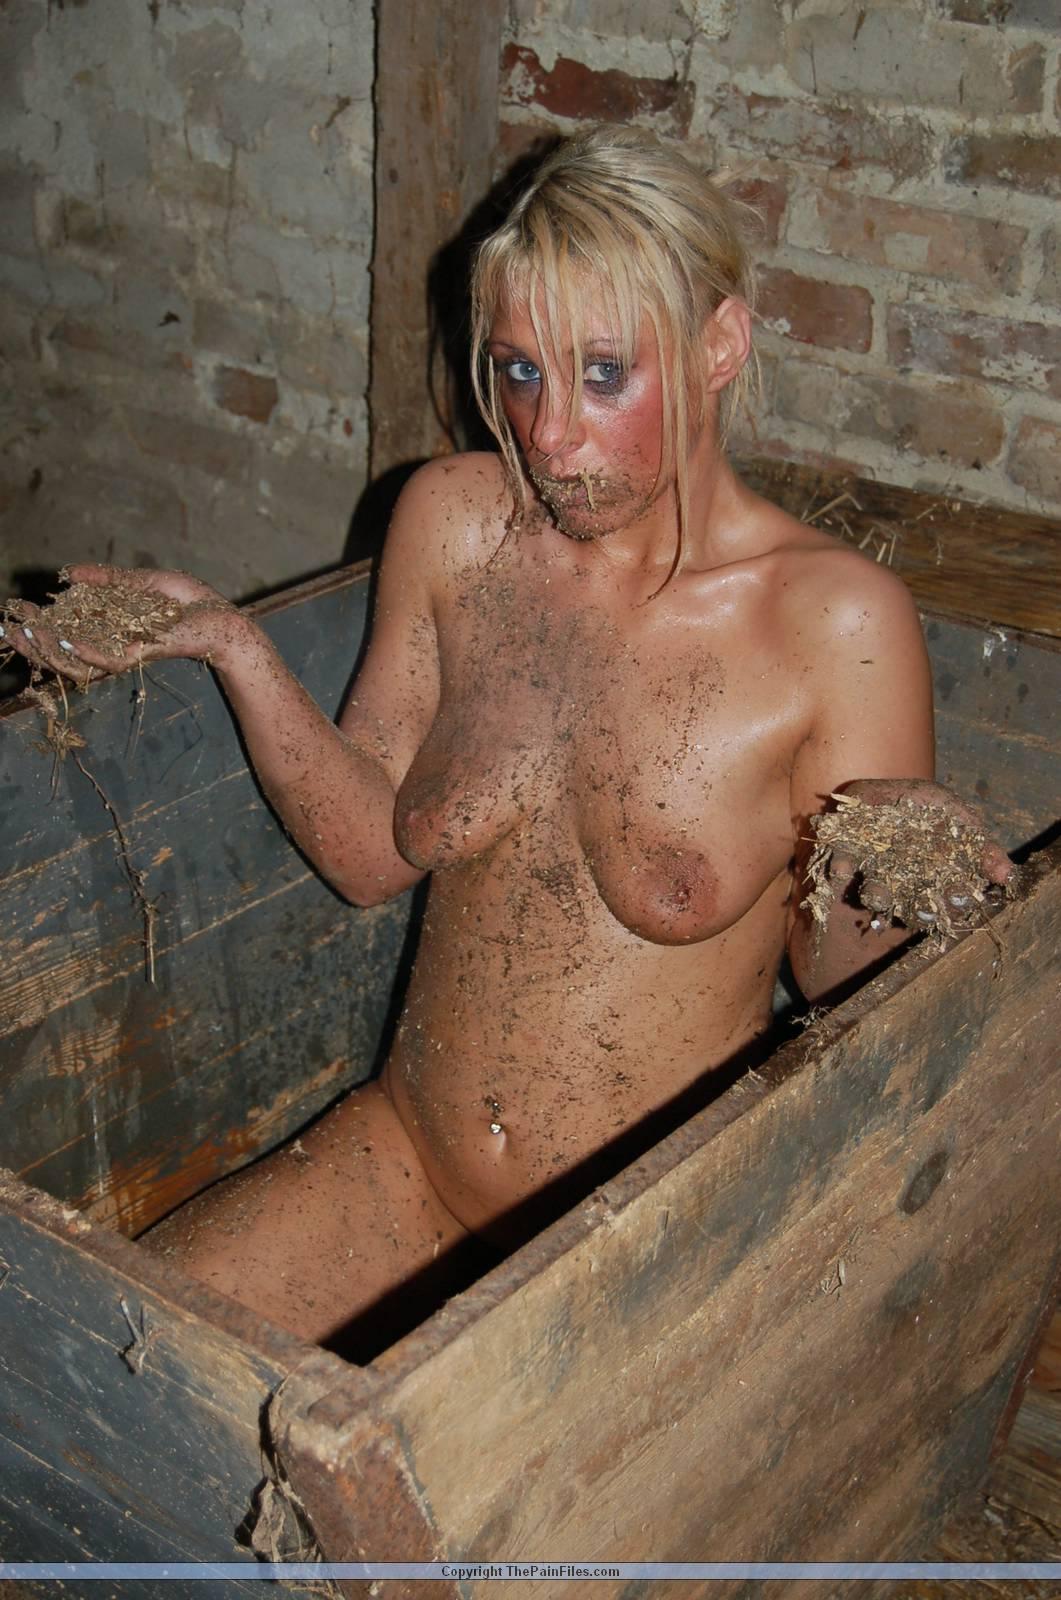 Helen shaver sex